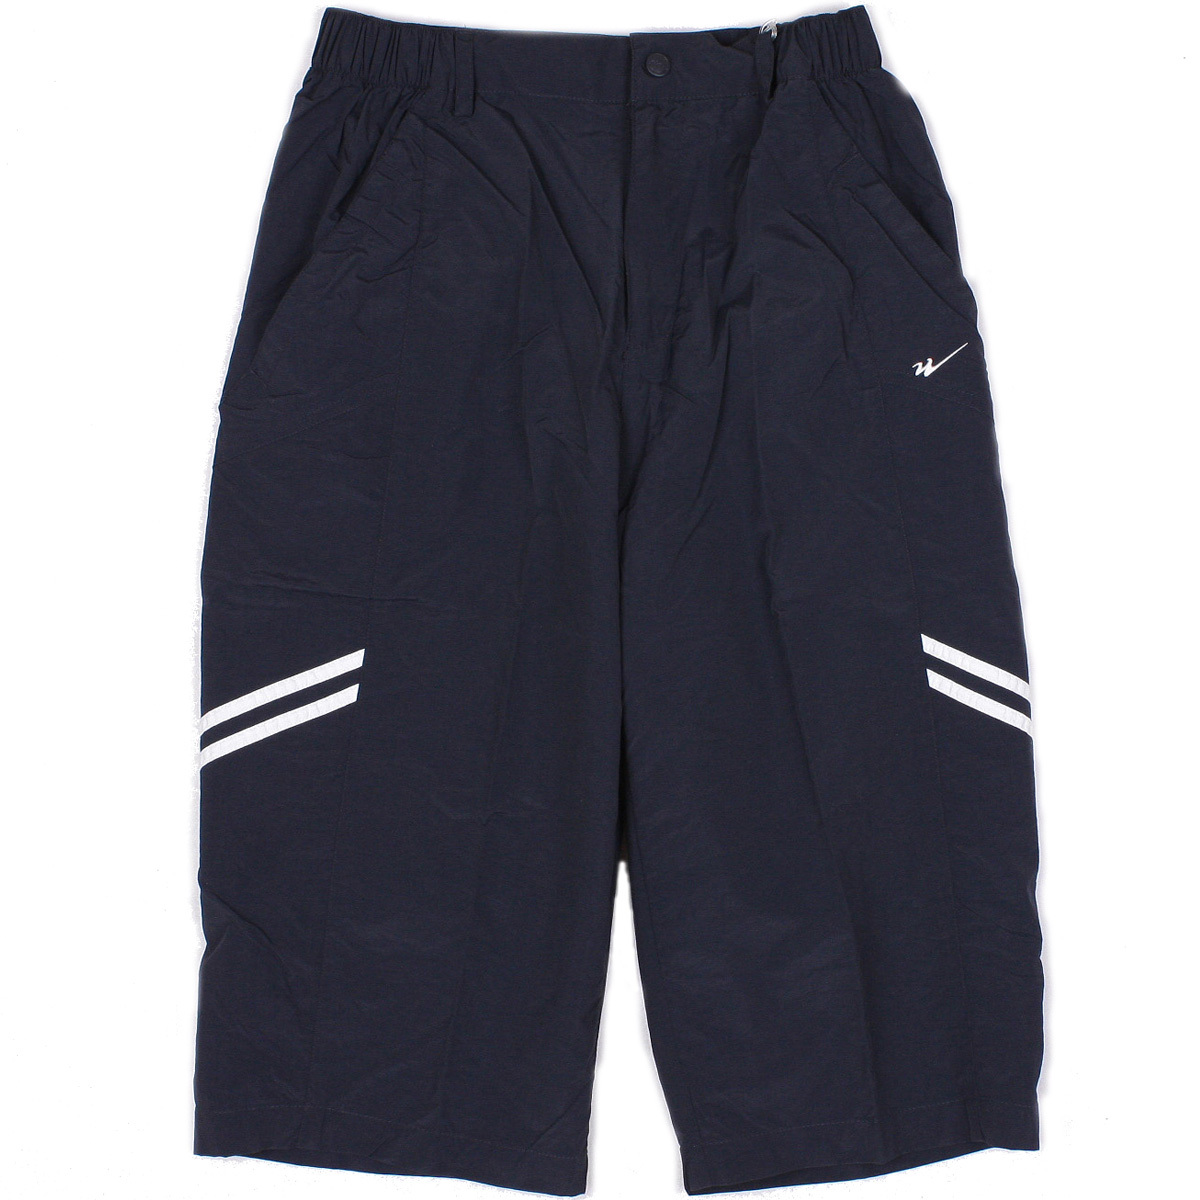 Спортивные шорты DOUBLE STAR ockm/3k207 3K207 Для мужчин